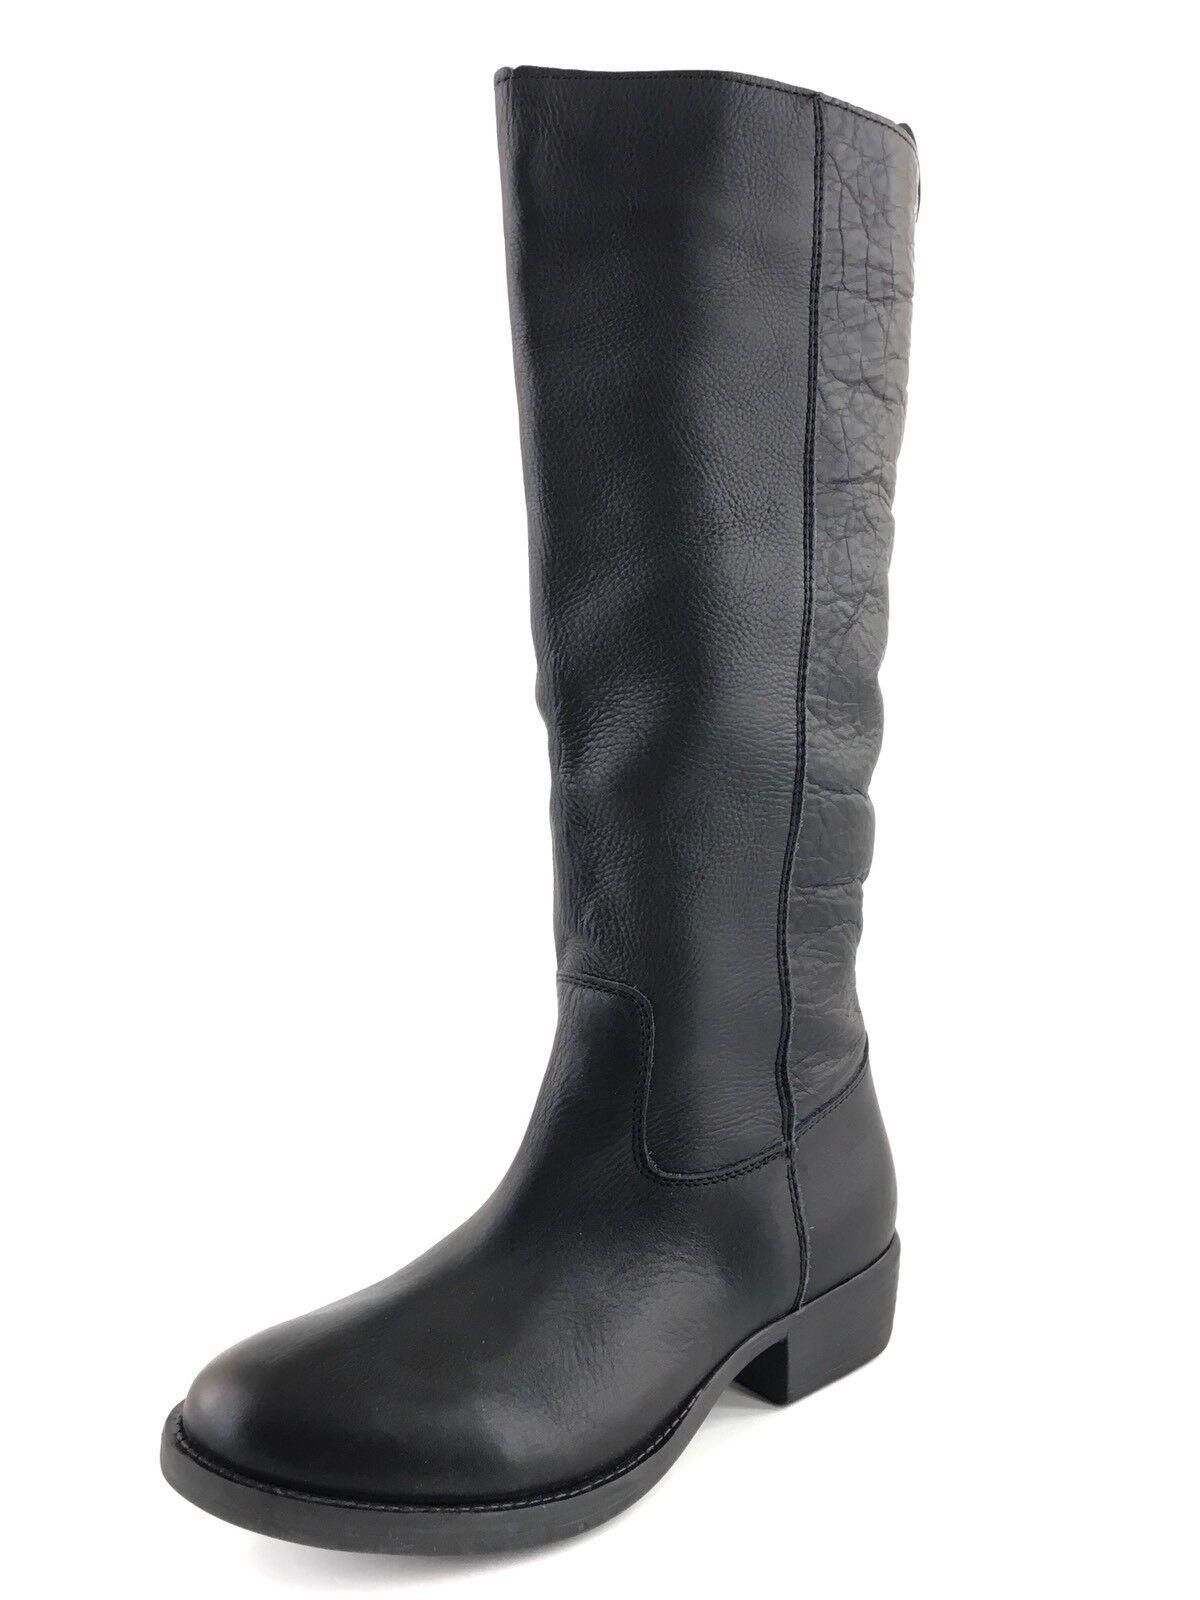 Zigi Soho Women's 'Layla' Black Leather Knee High Riding Boots Womens Size 5 M*